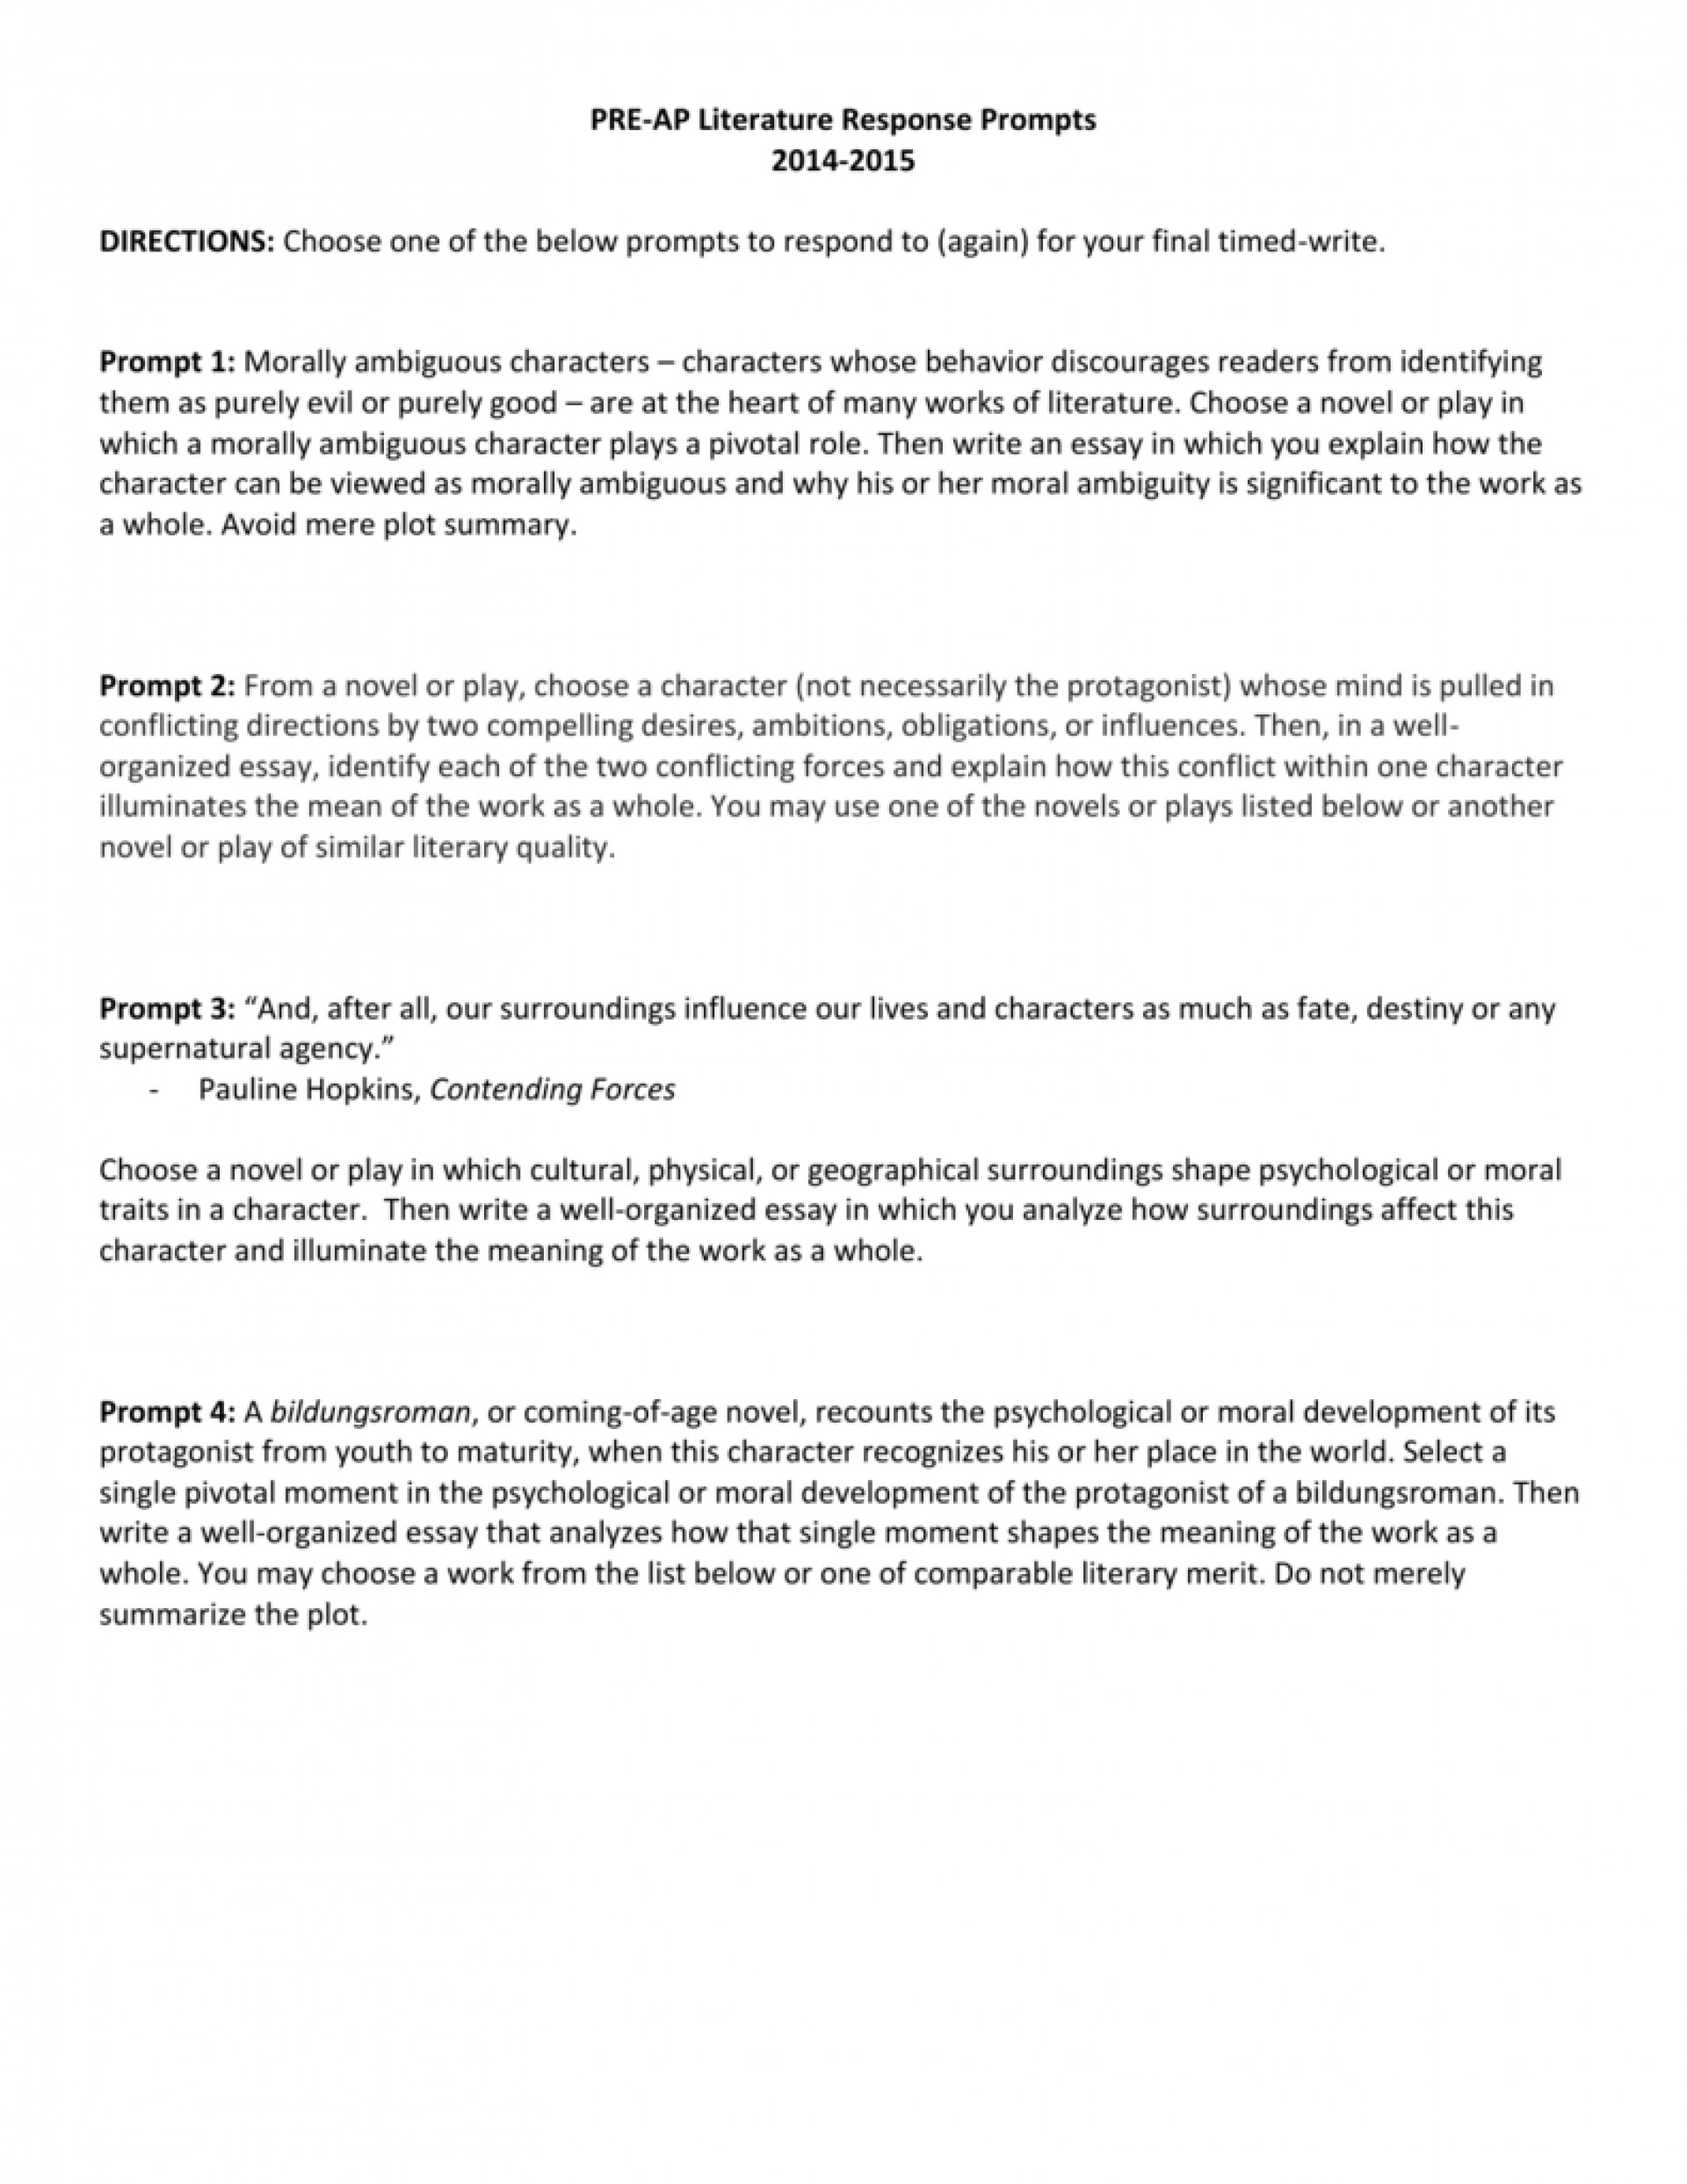 002 006690928 1 Ap Literature Essay Prompts Stunning List 2008 Macbeth 1920